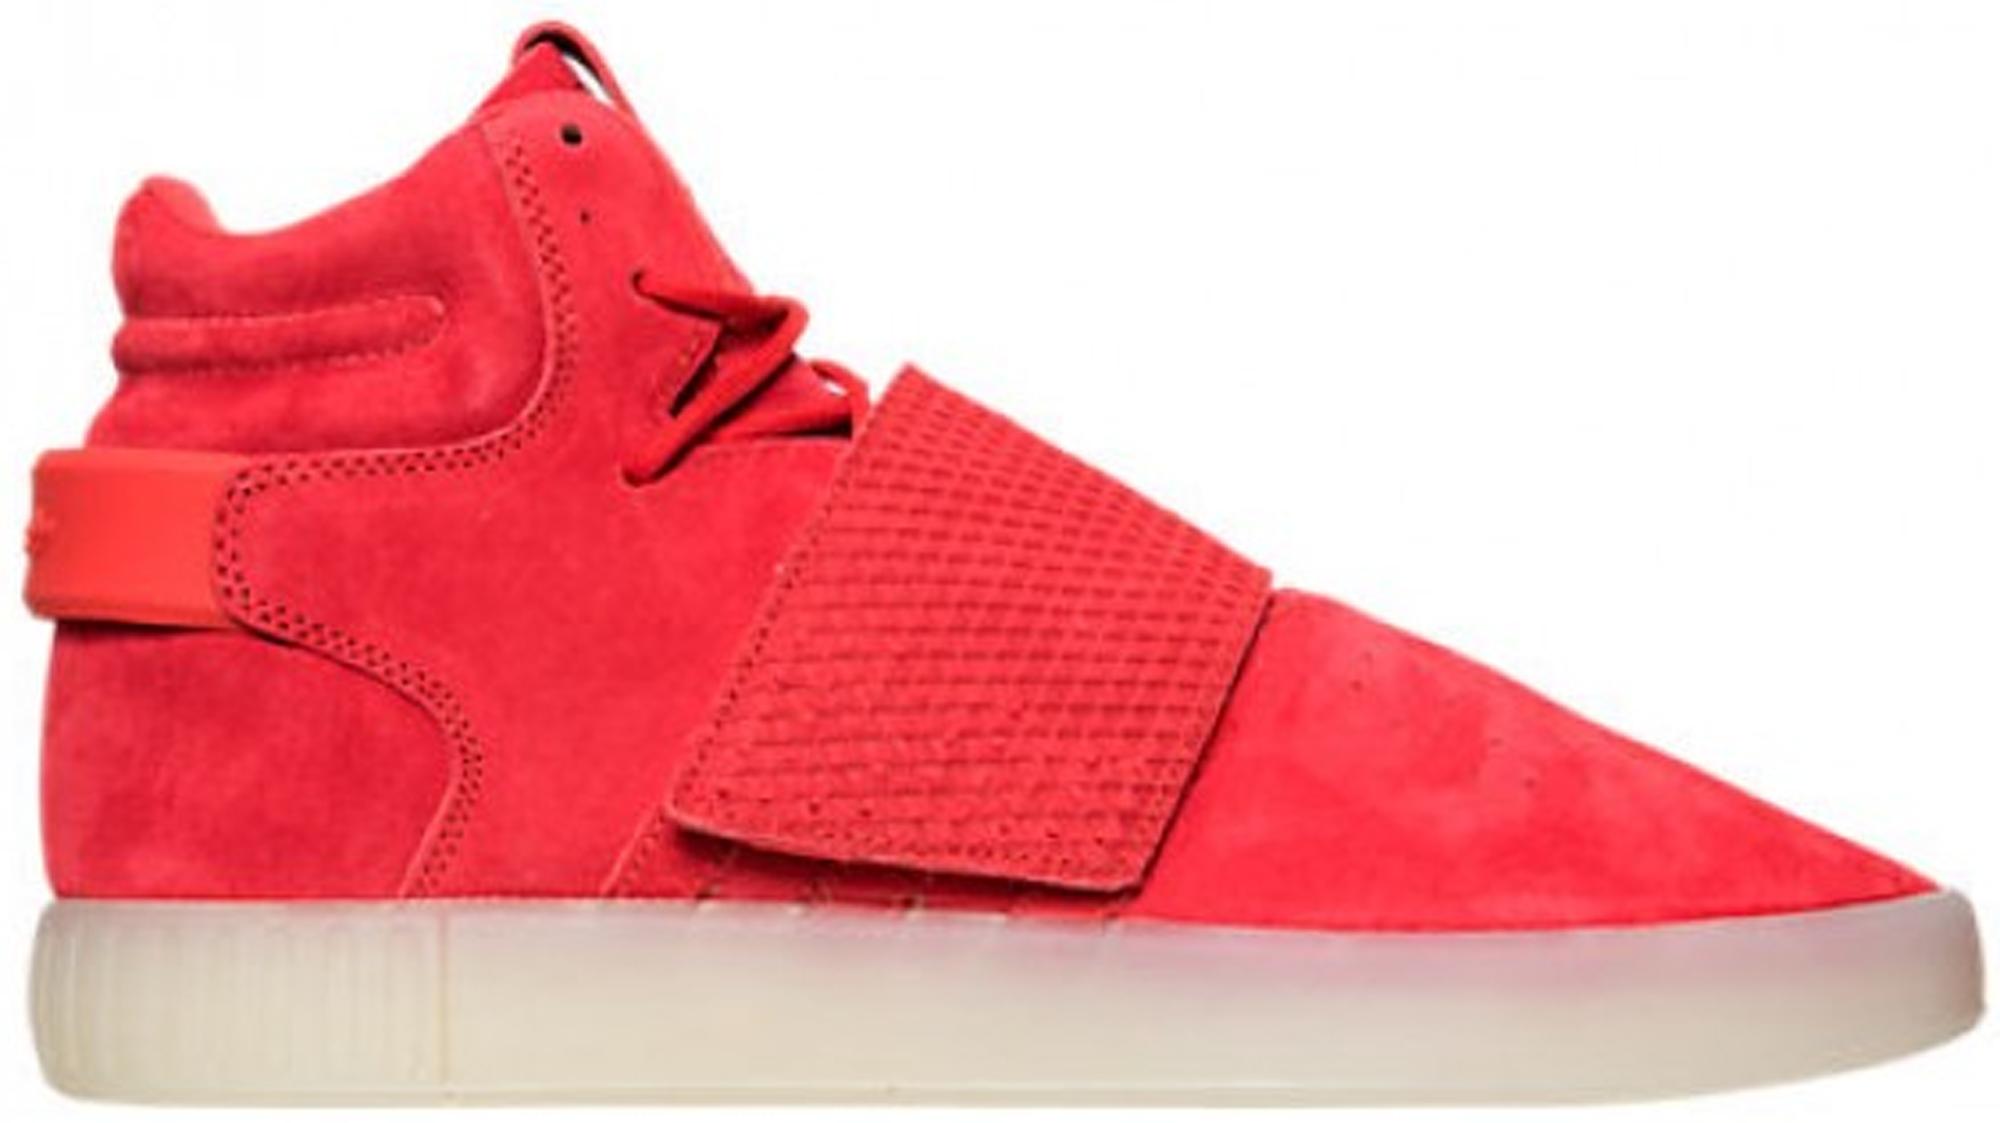 adidas Tubular Invader Strap Red - BB5039